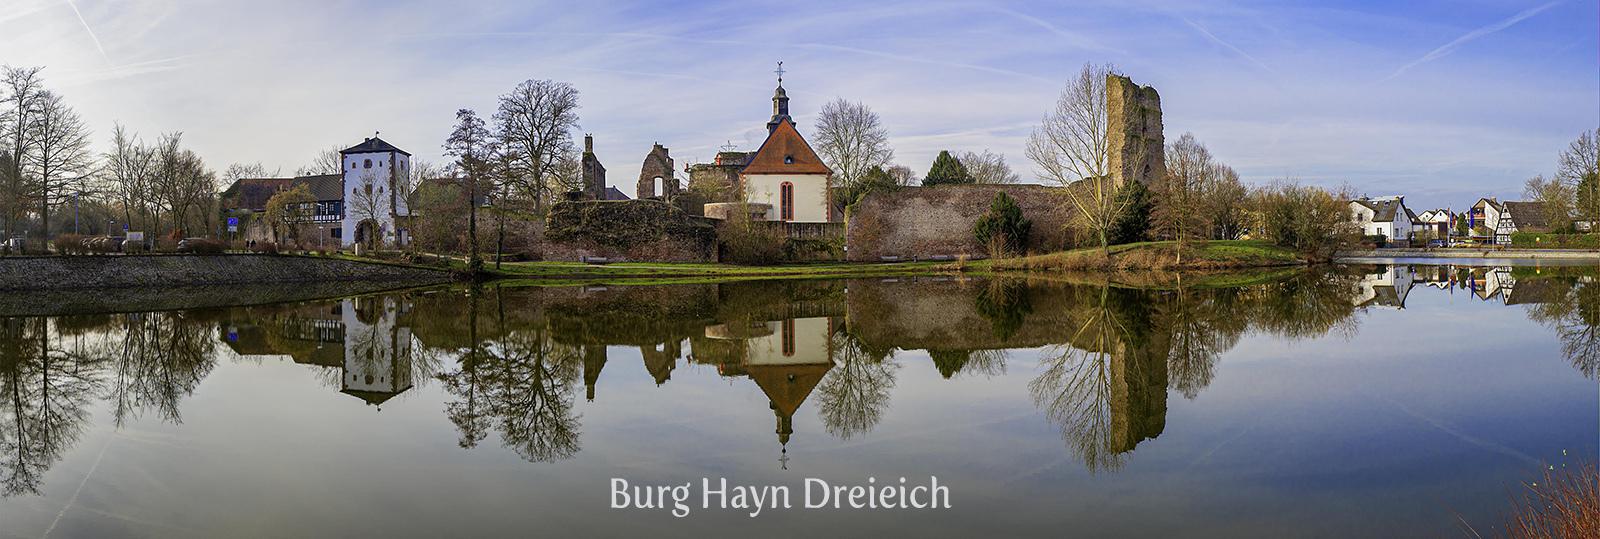 Castle ruin Burg Hayn in Dreieich is a magnet